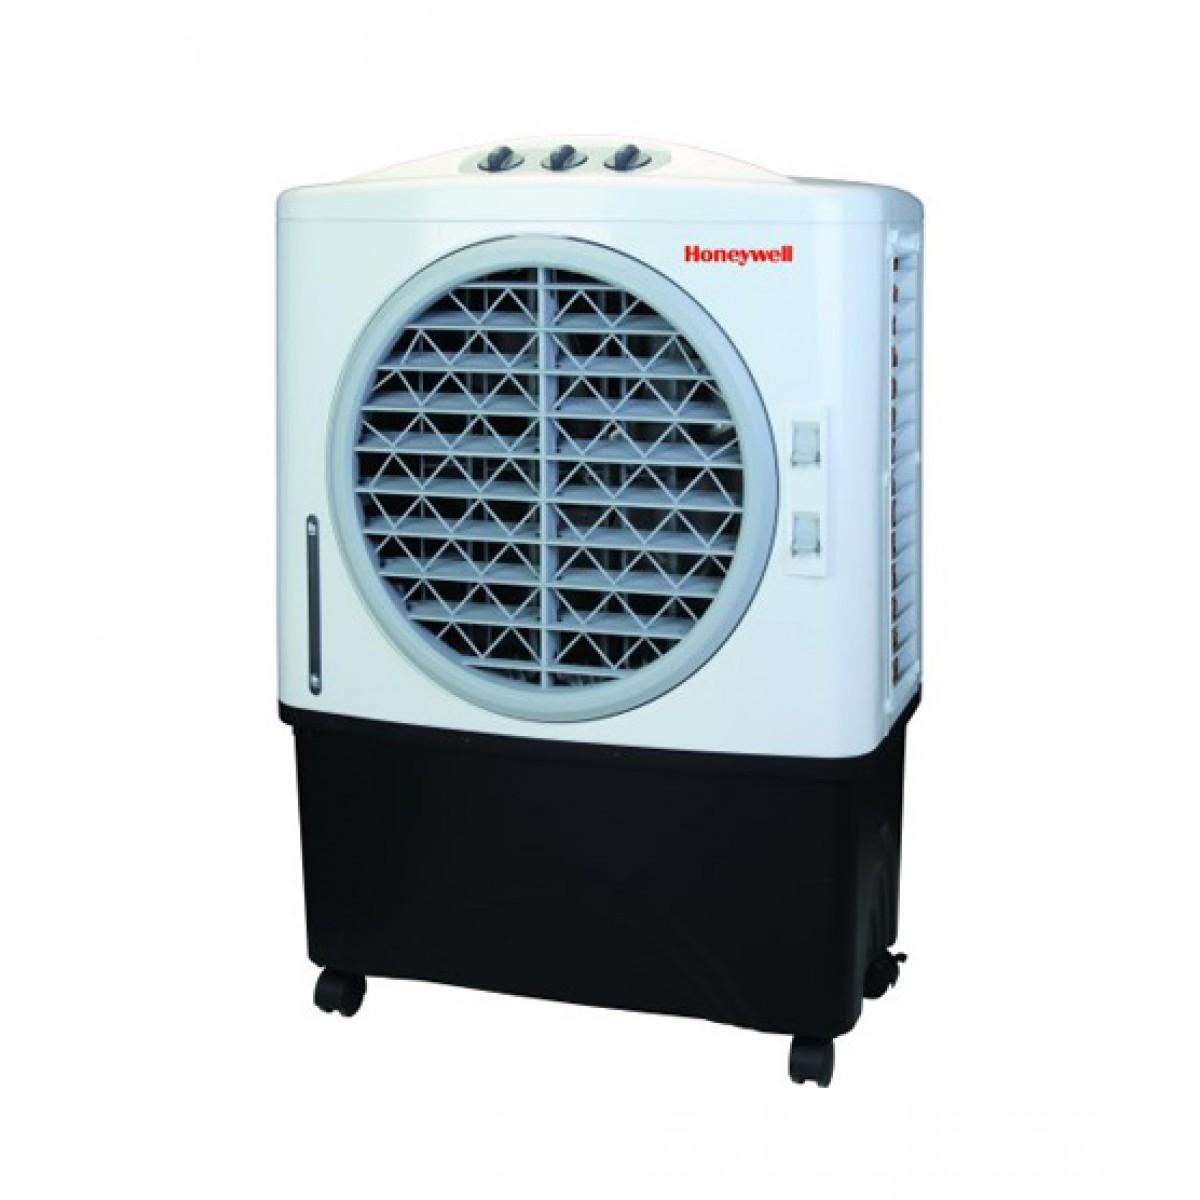 Attraktiva Honeywell Air Cooler Price in Pakistan   Buy Honeywell 48-Liter GK-22